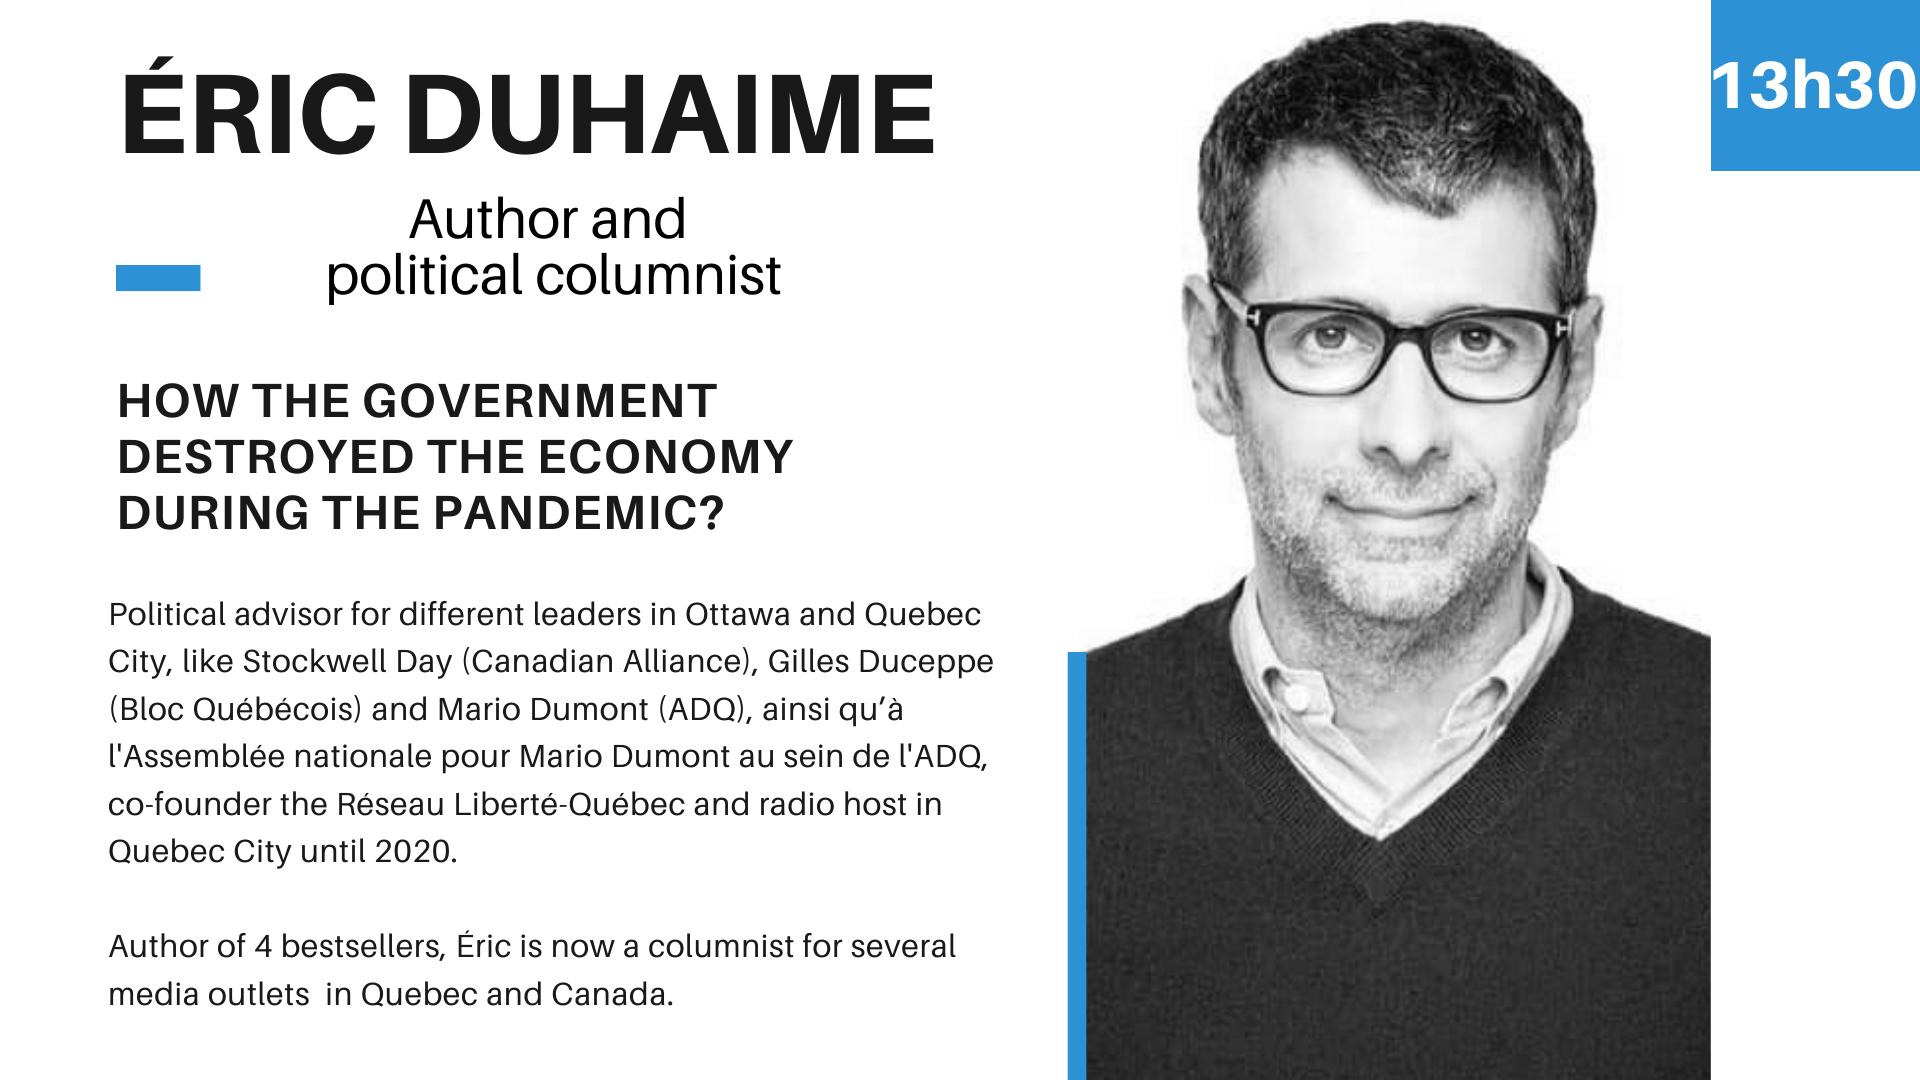 Speaker Éric Duhaime